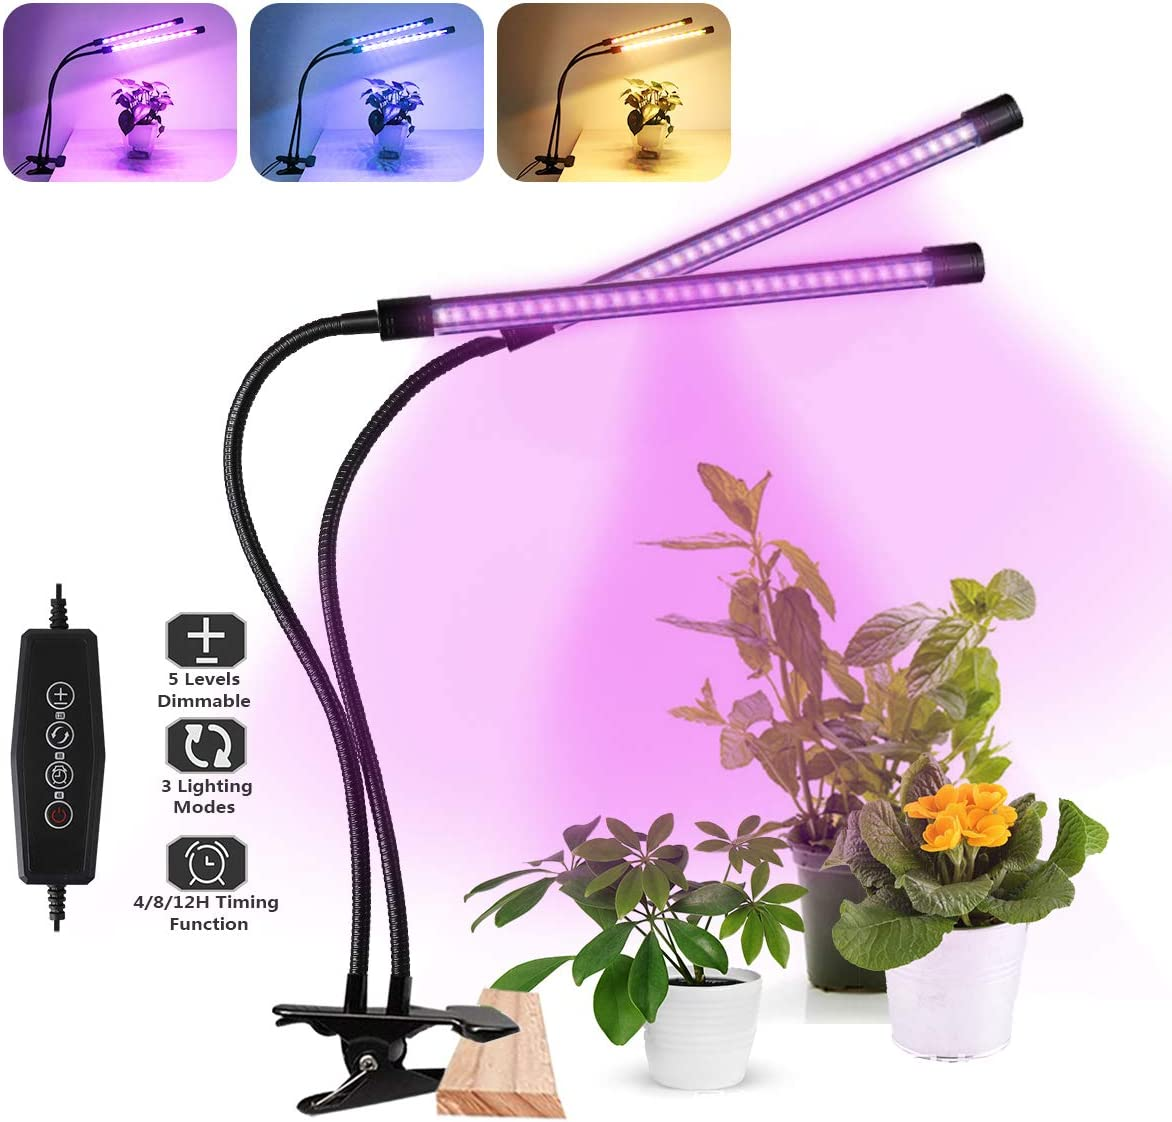 360° LED Grow Light Plant Growing Lamp Lights 3 Timer Modes /& Clip For    V